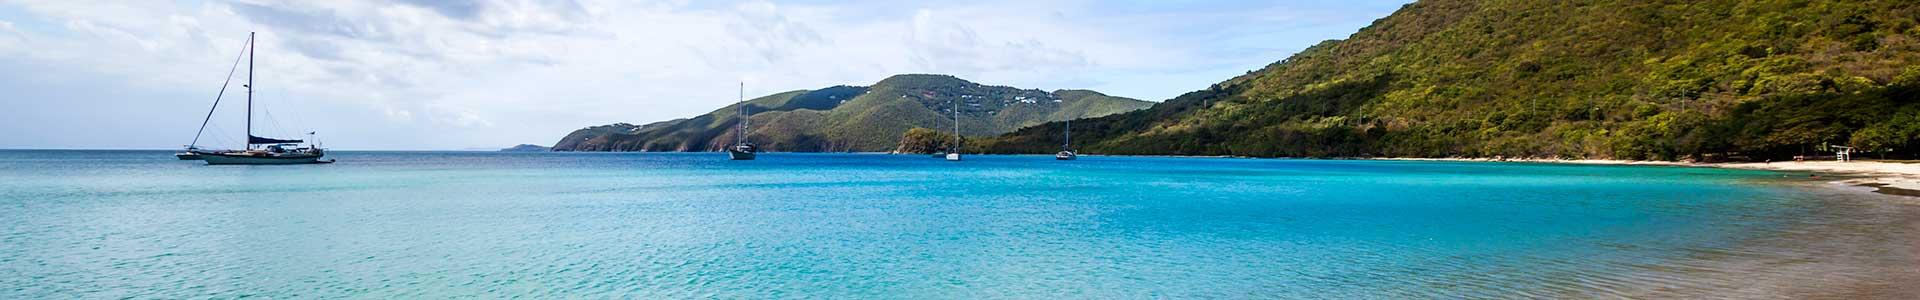 Voyage à Saint-Martin - TUI